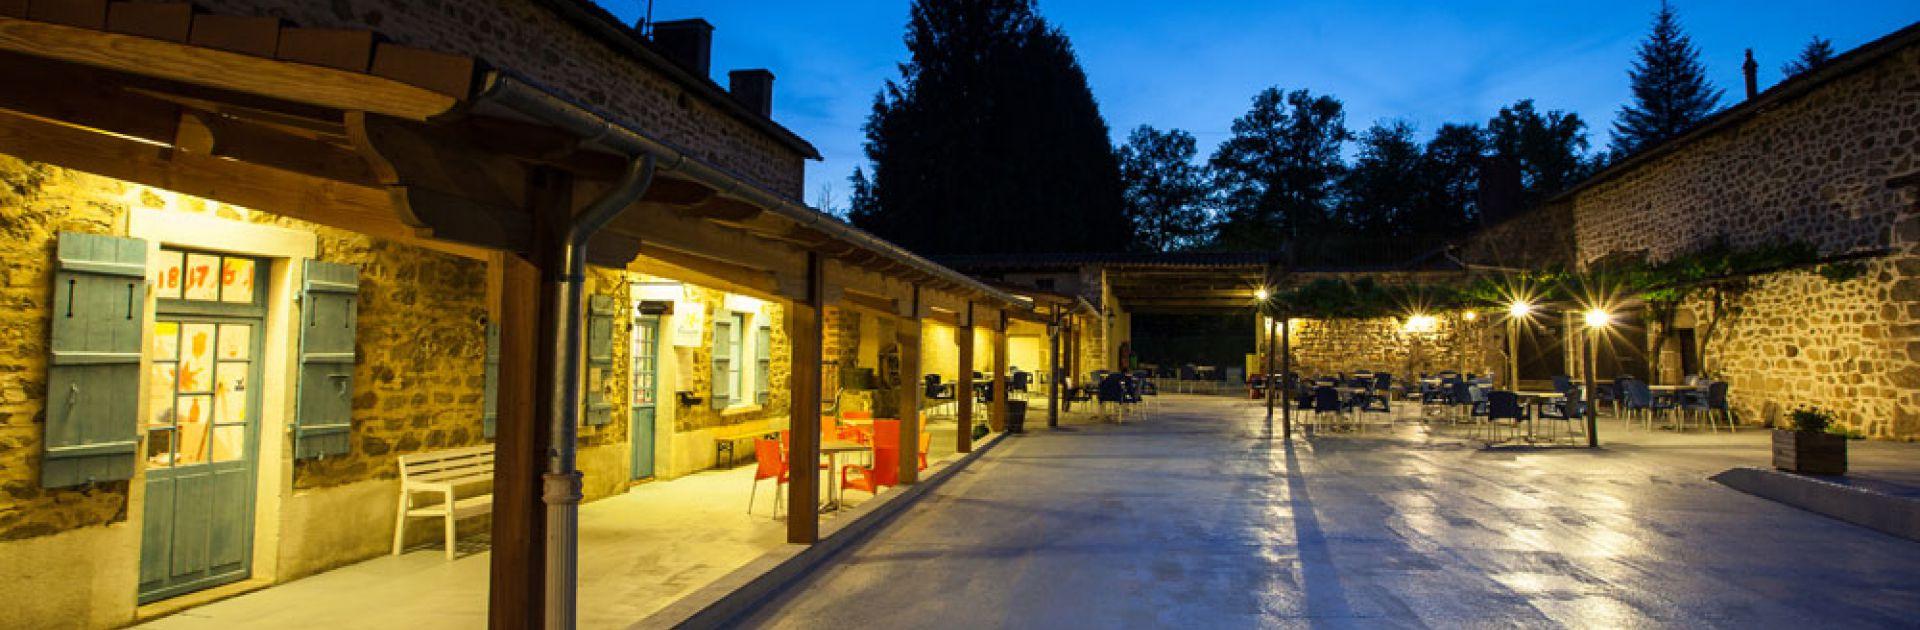 réception, Bar, Restaurant, Shop etc... camping Dordogne